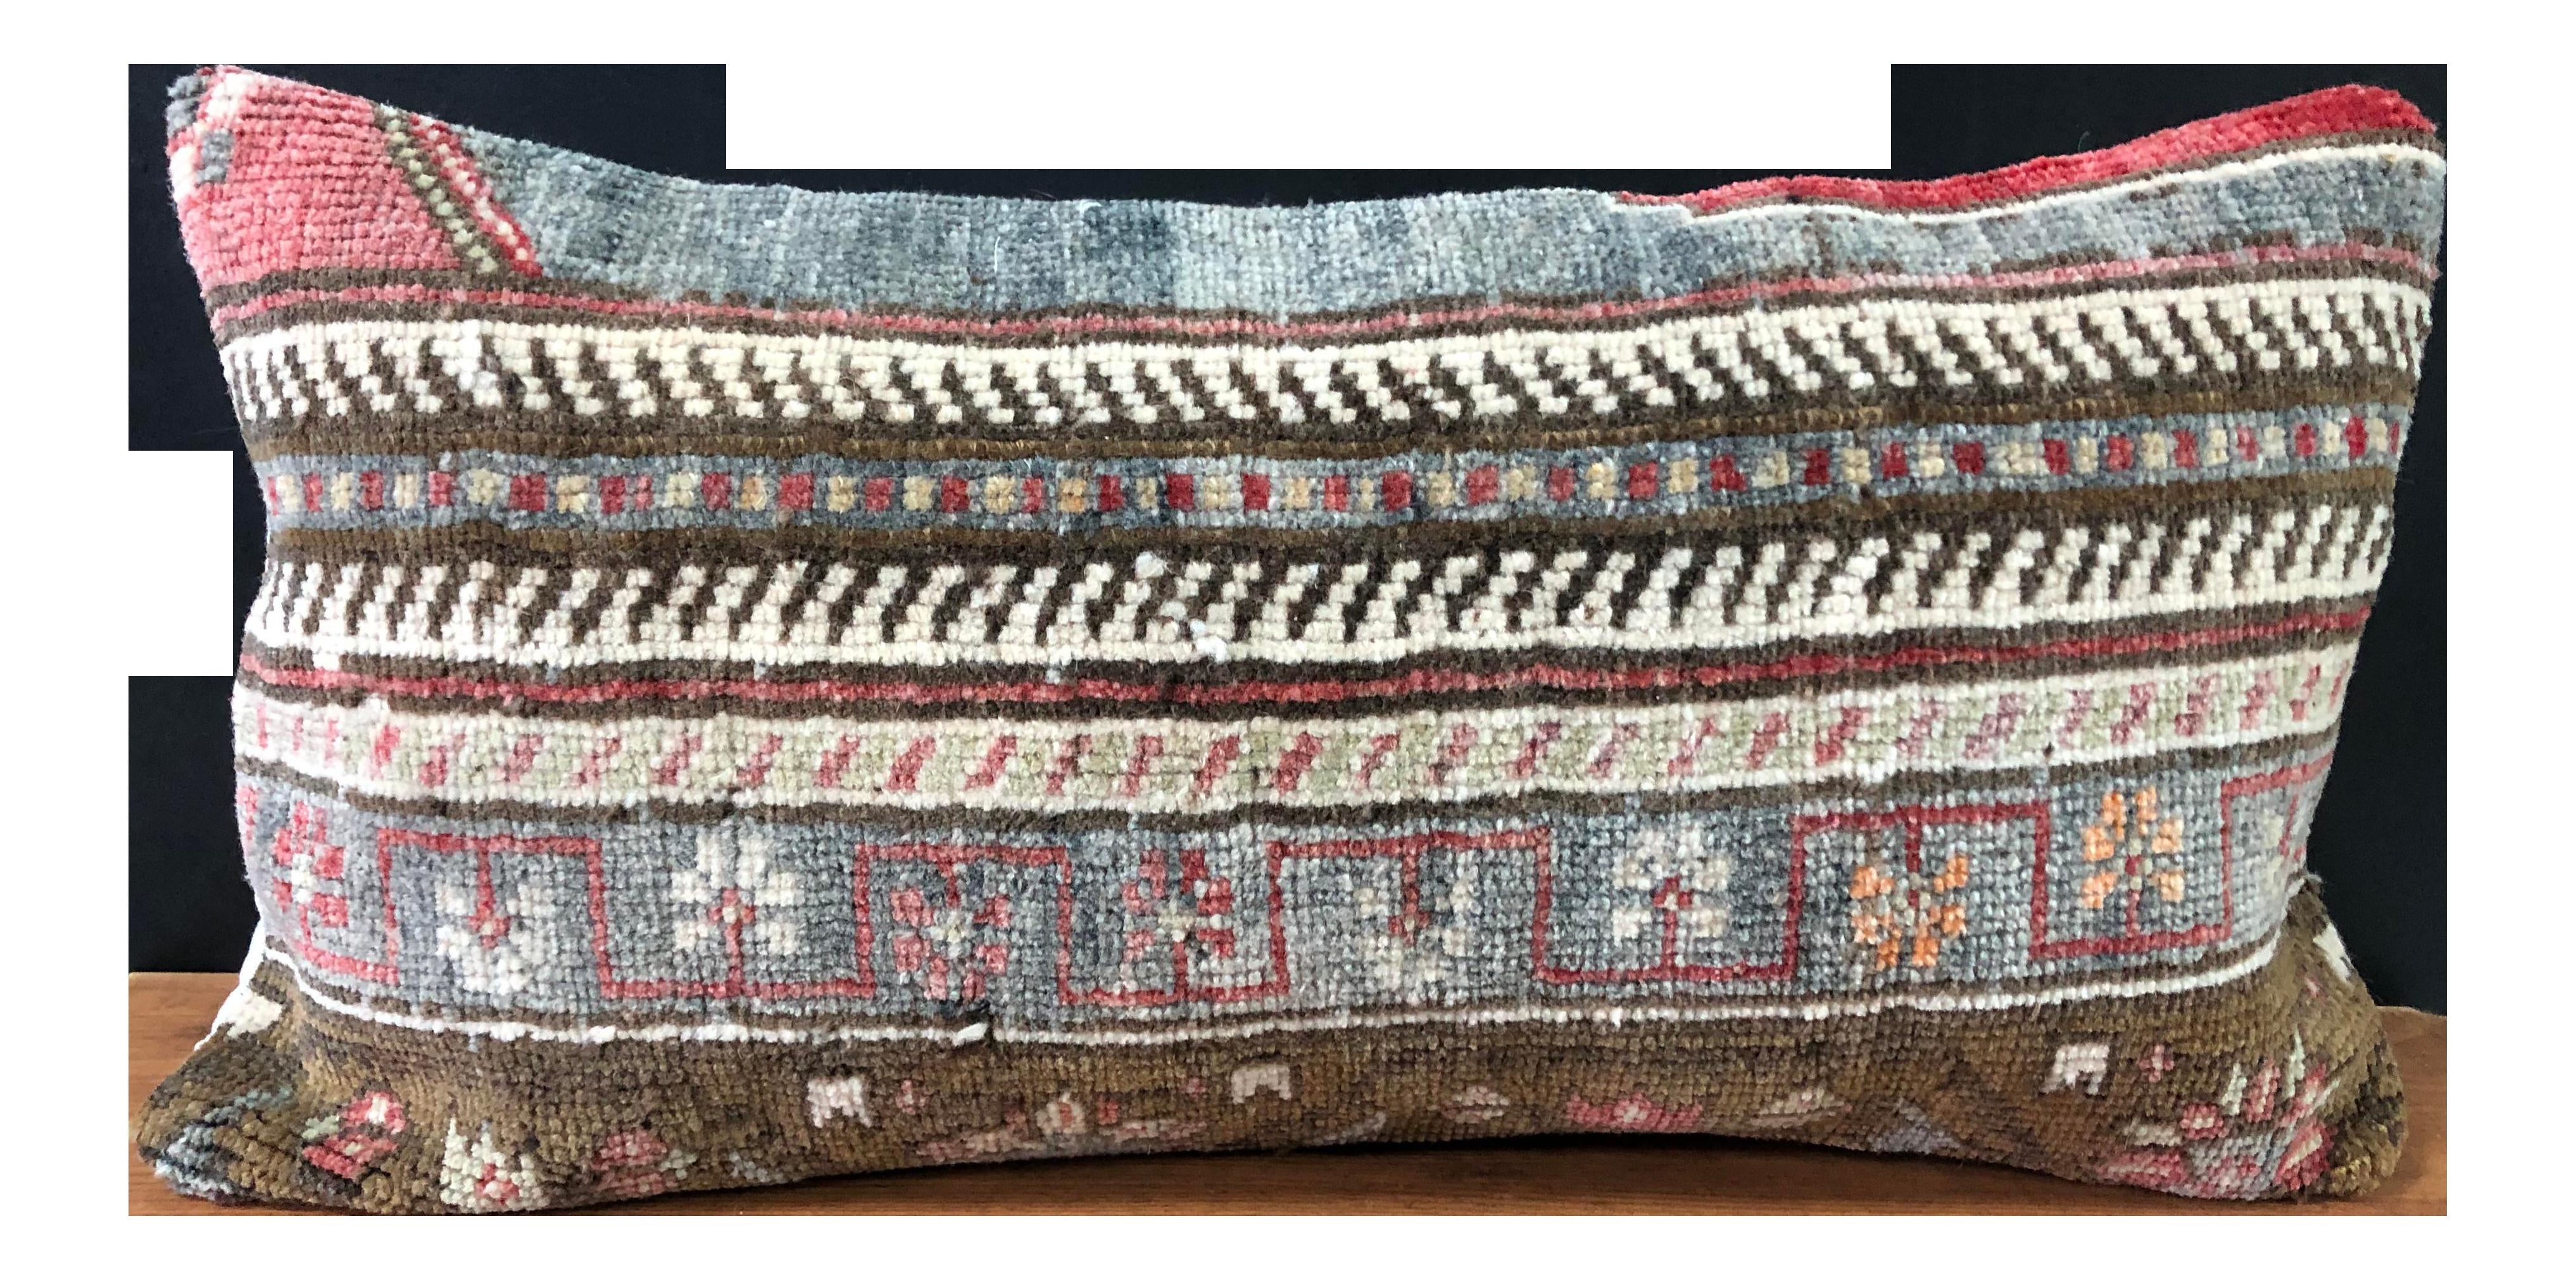 Decorative Carpet Pillow Cushion cover made from Vintage Turkish Anatolian Rug E0011U 14x20 35x50cm